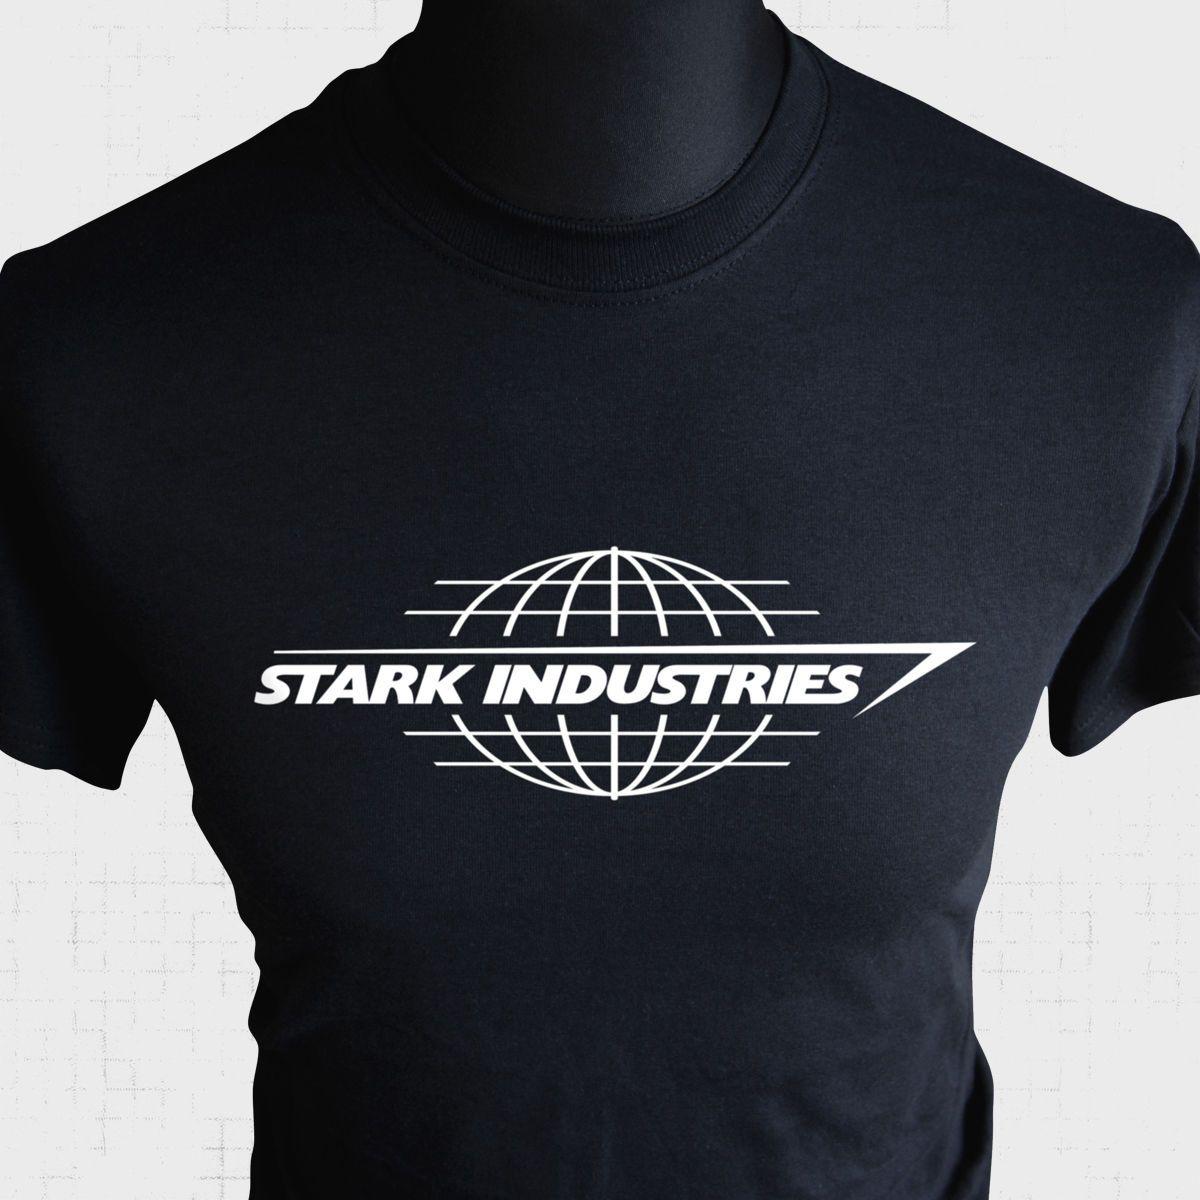 3bef721946bb Stark Industries T Shirt Iron Man Tony Avengers Assemble Cool Comic Book  Hero Bk Funny Unisex Casual Tshirt Top Cool Looking T Shirts Buy Designer  Shirts ...